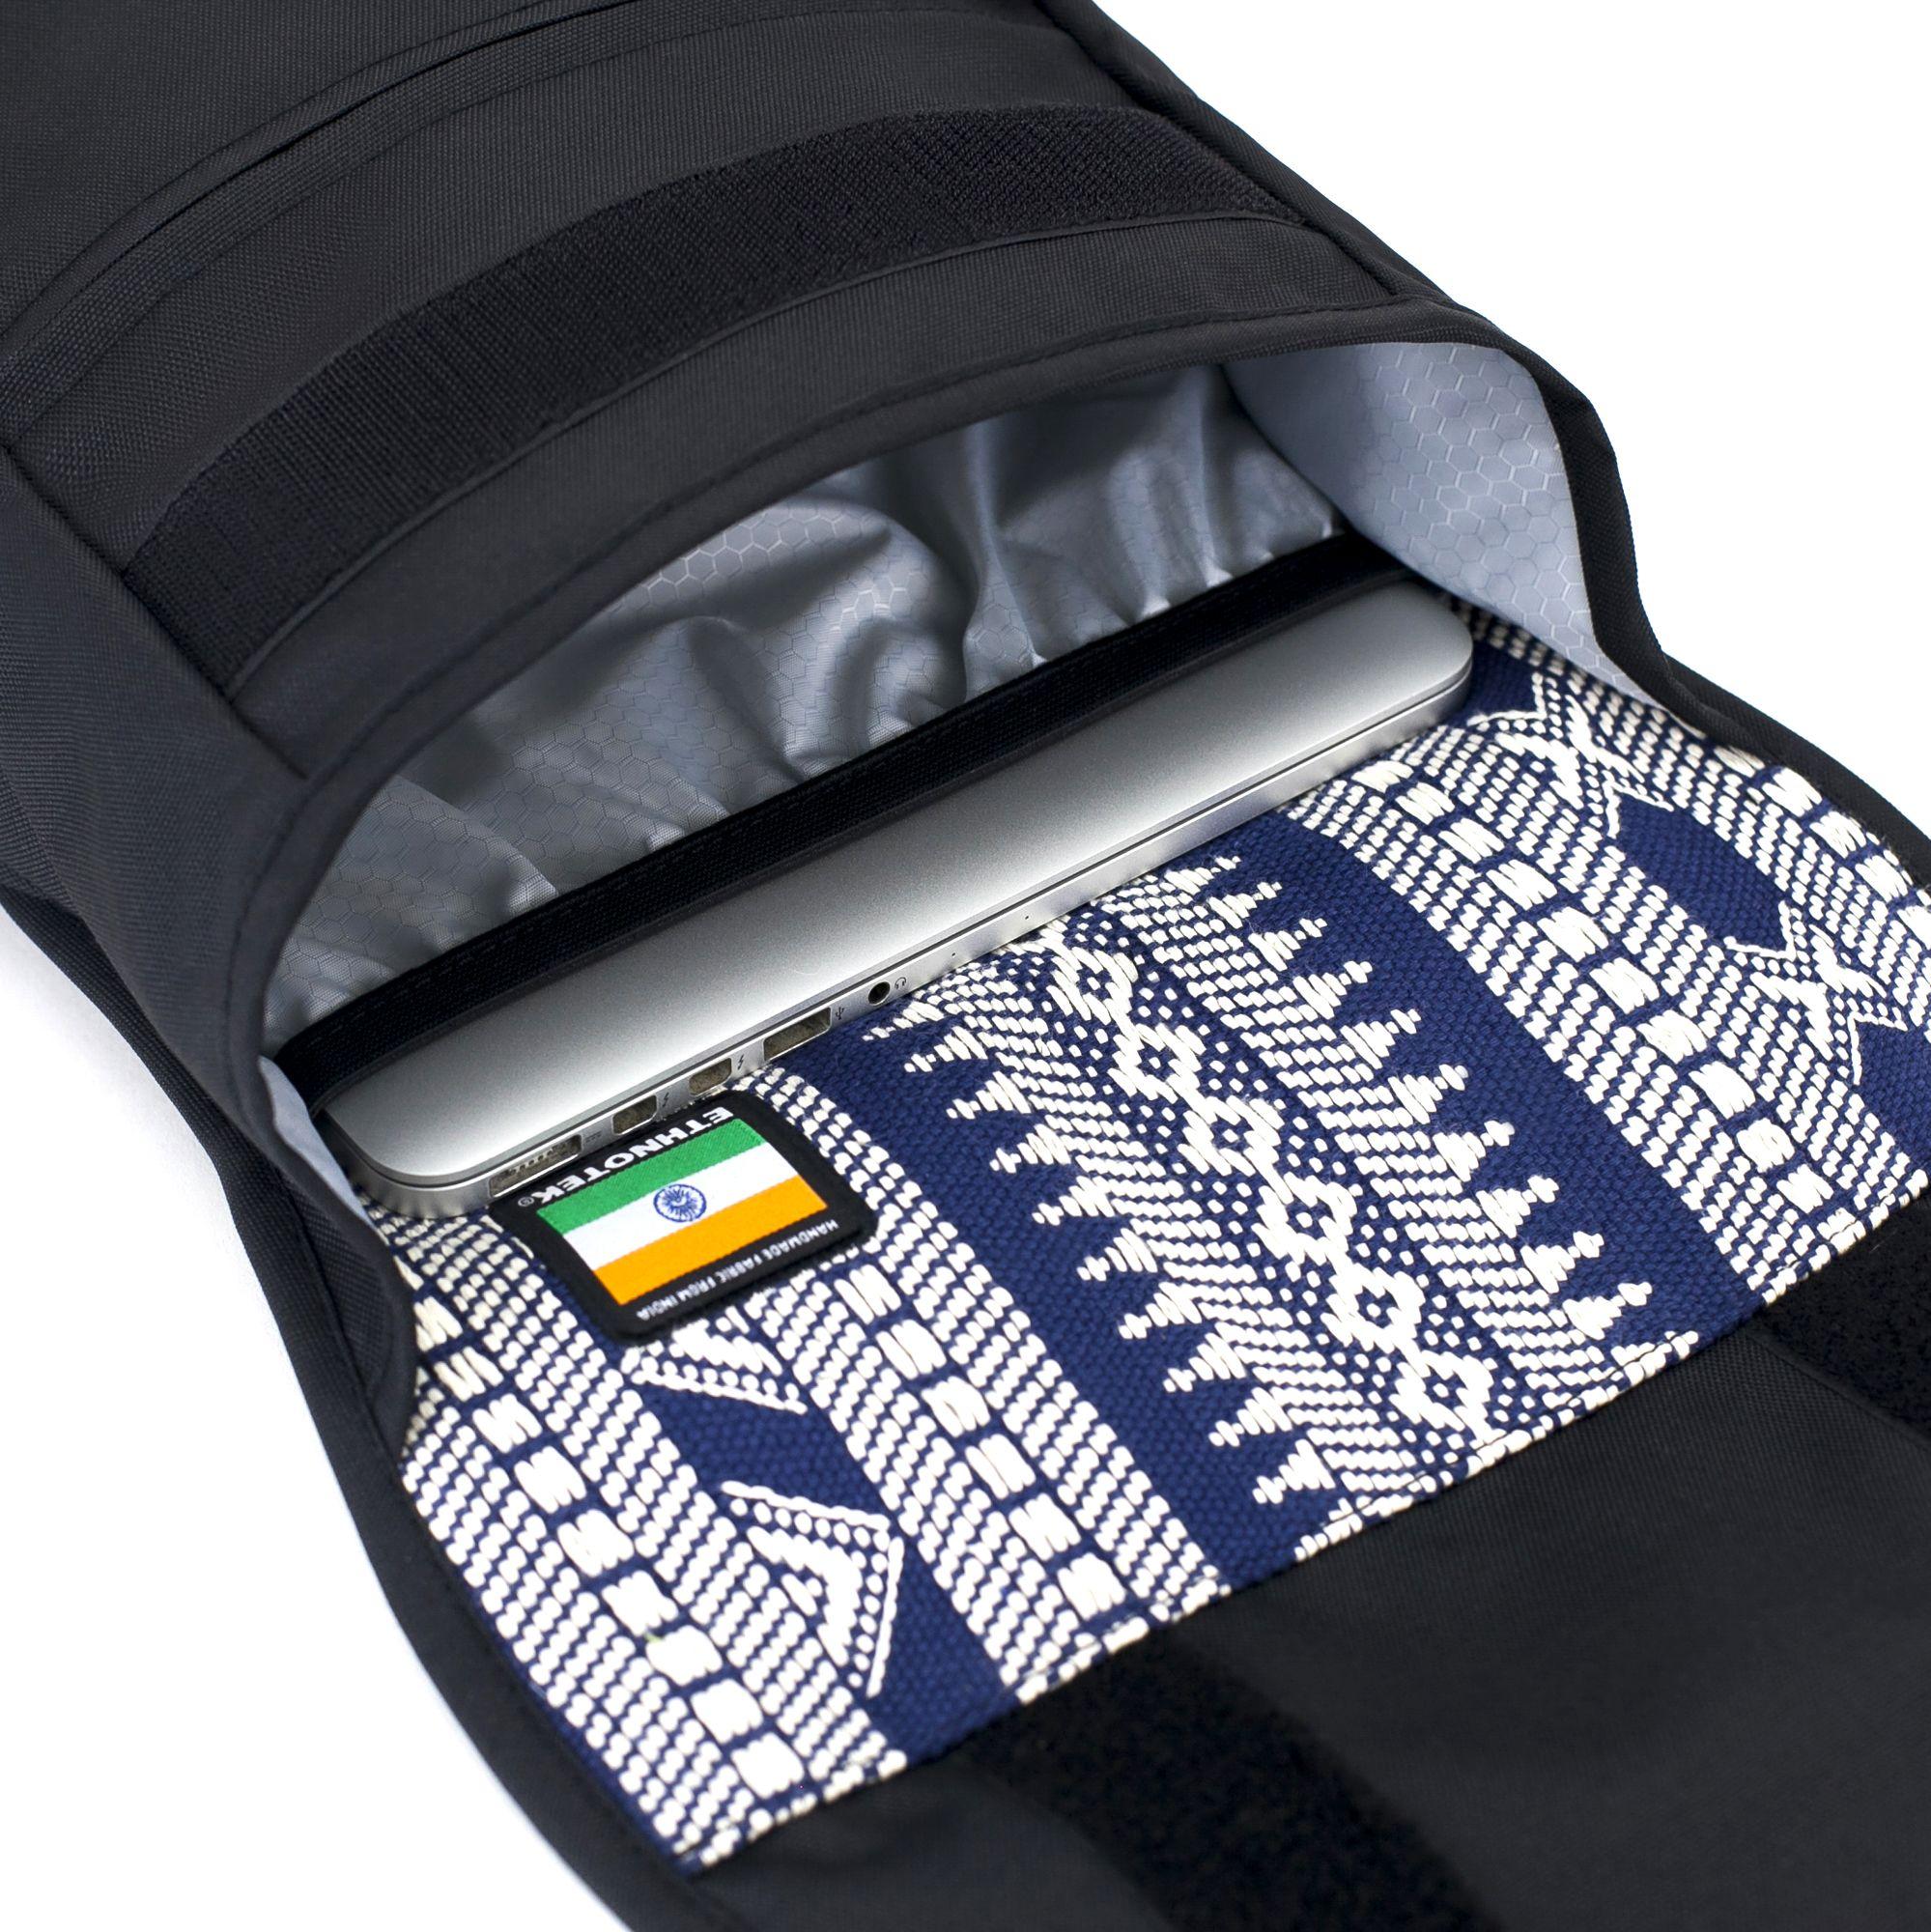 Atma Ecopack 13 India 14